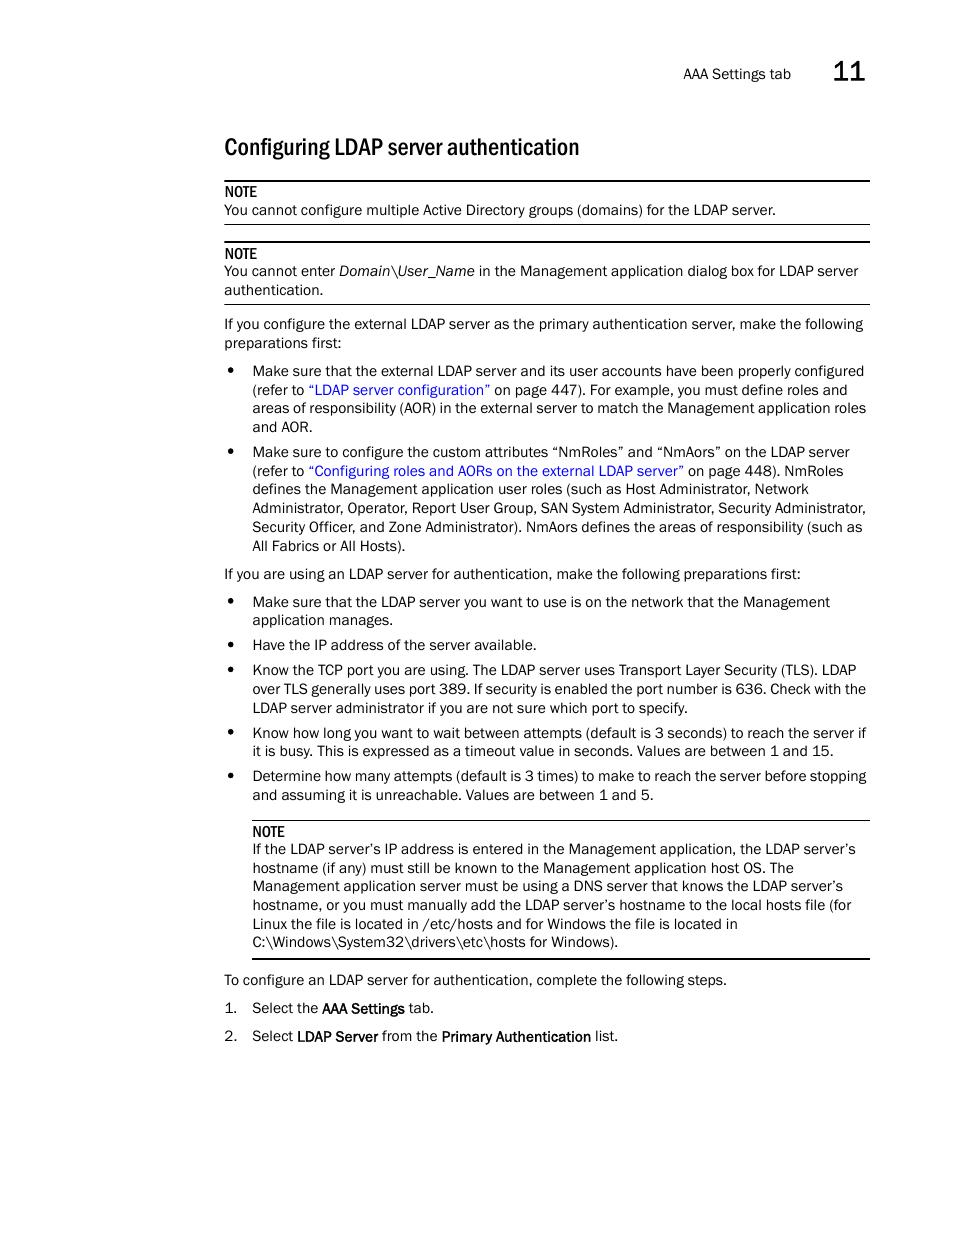 garmin nuvi 1490 manual pdf